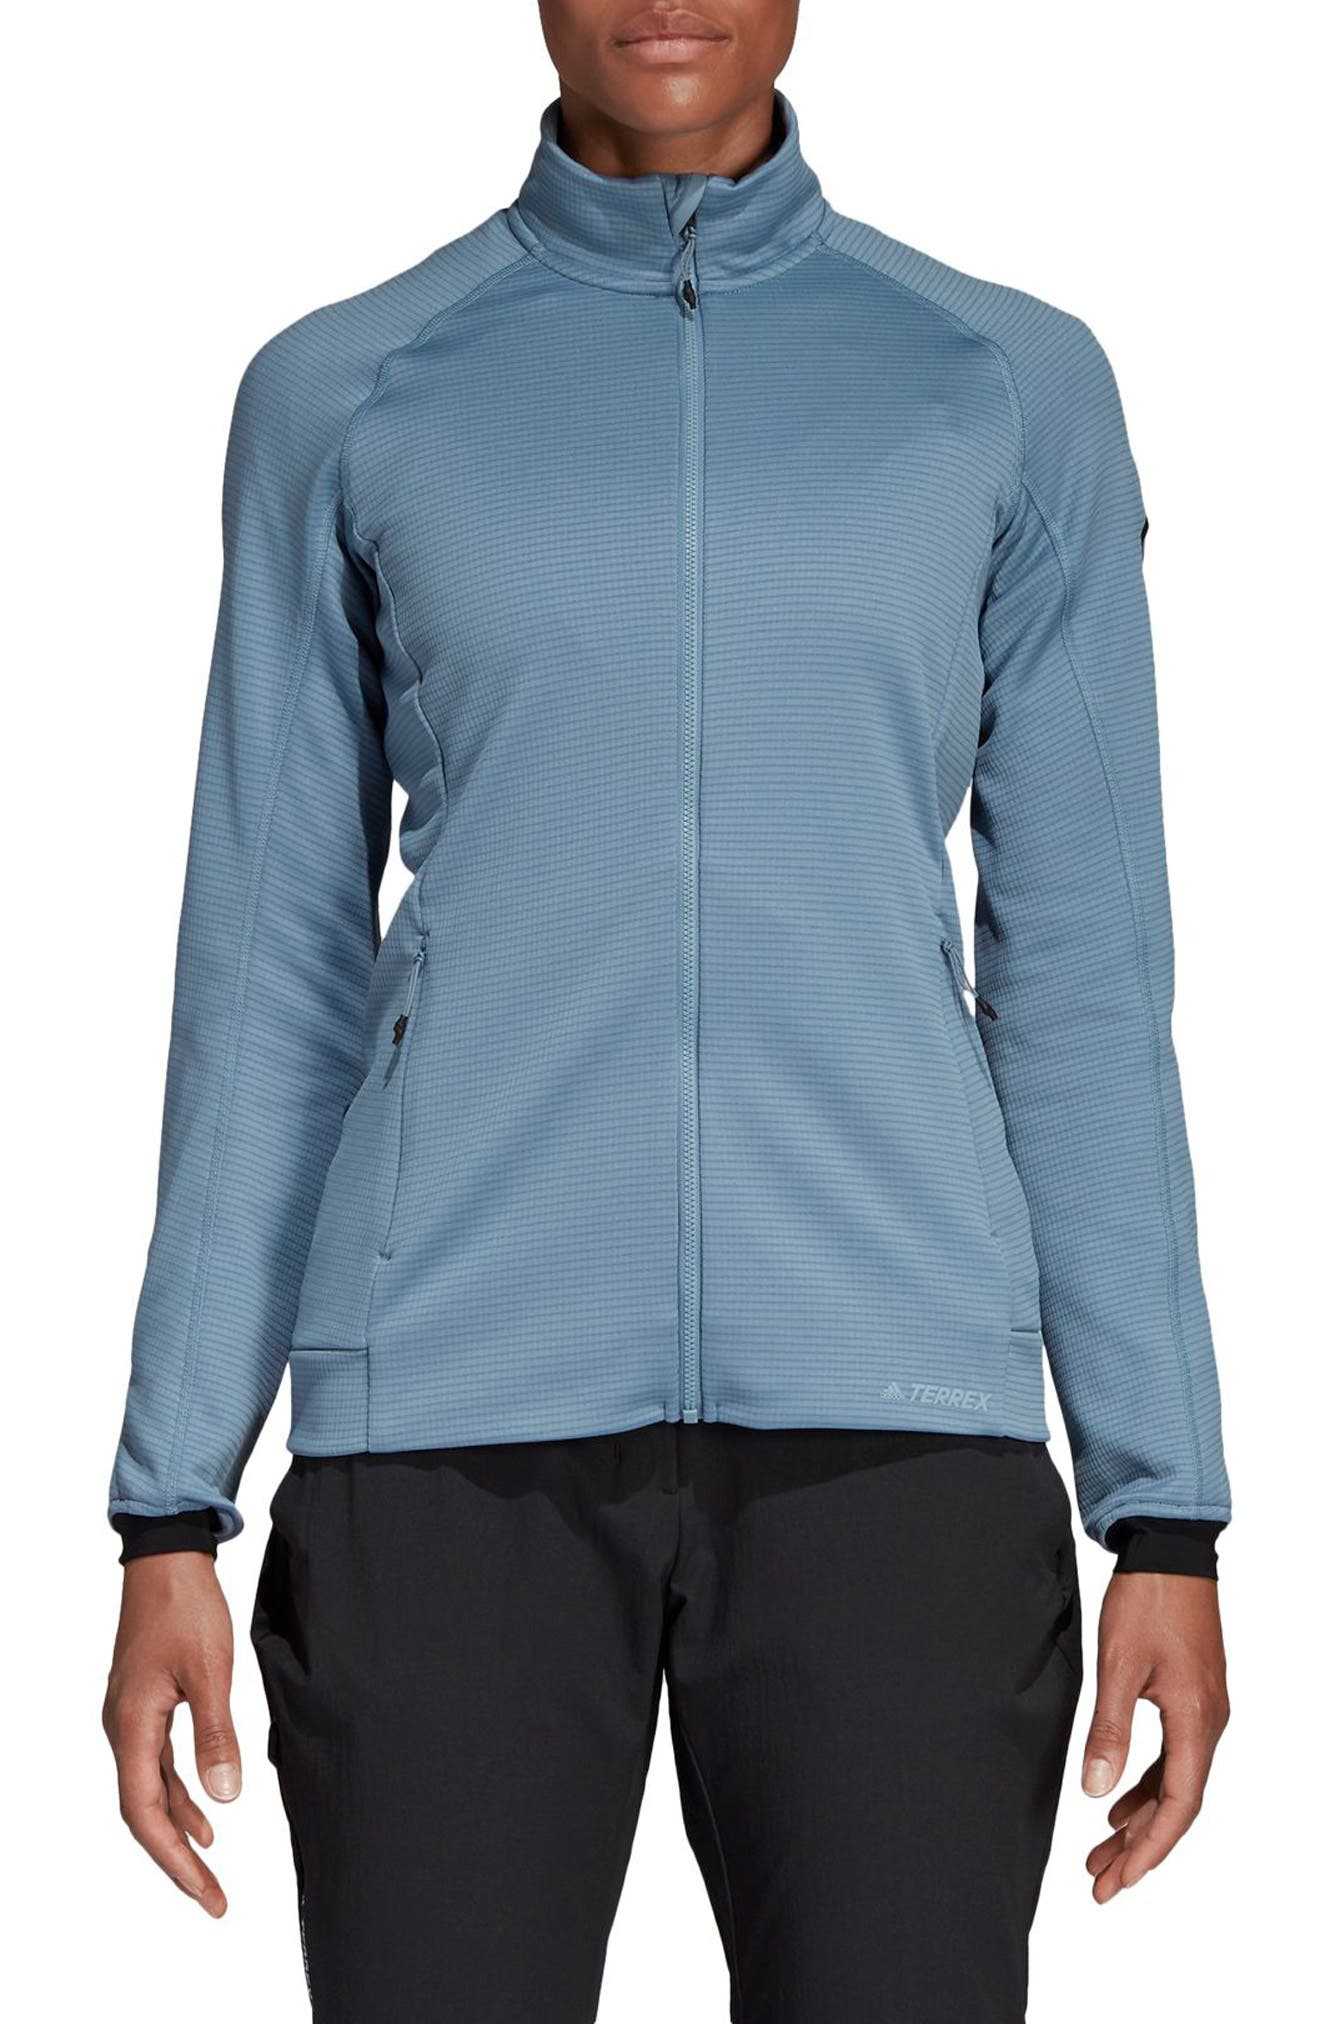 Adidas Stockhorn Fleece Jacket, Blue